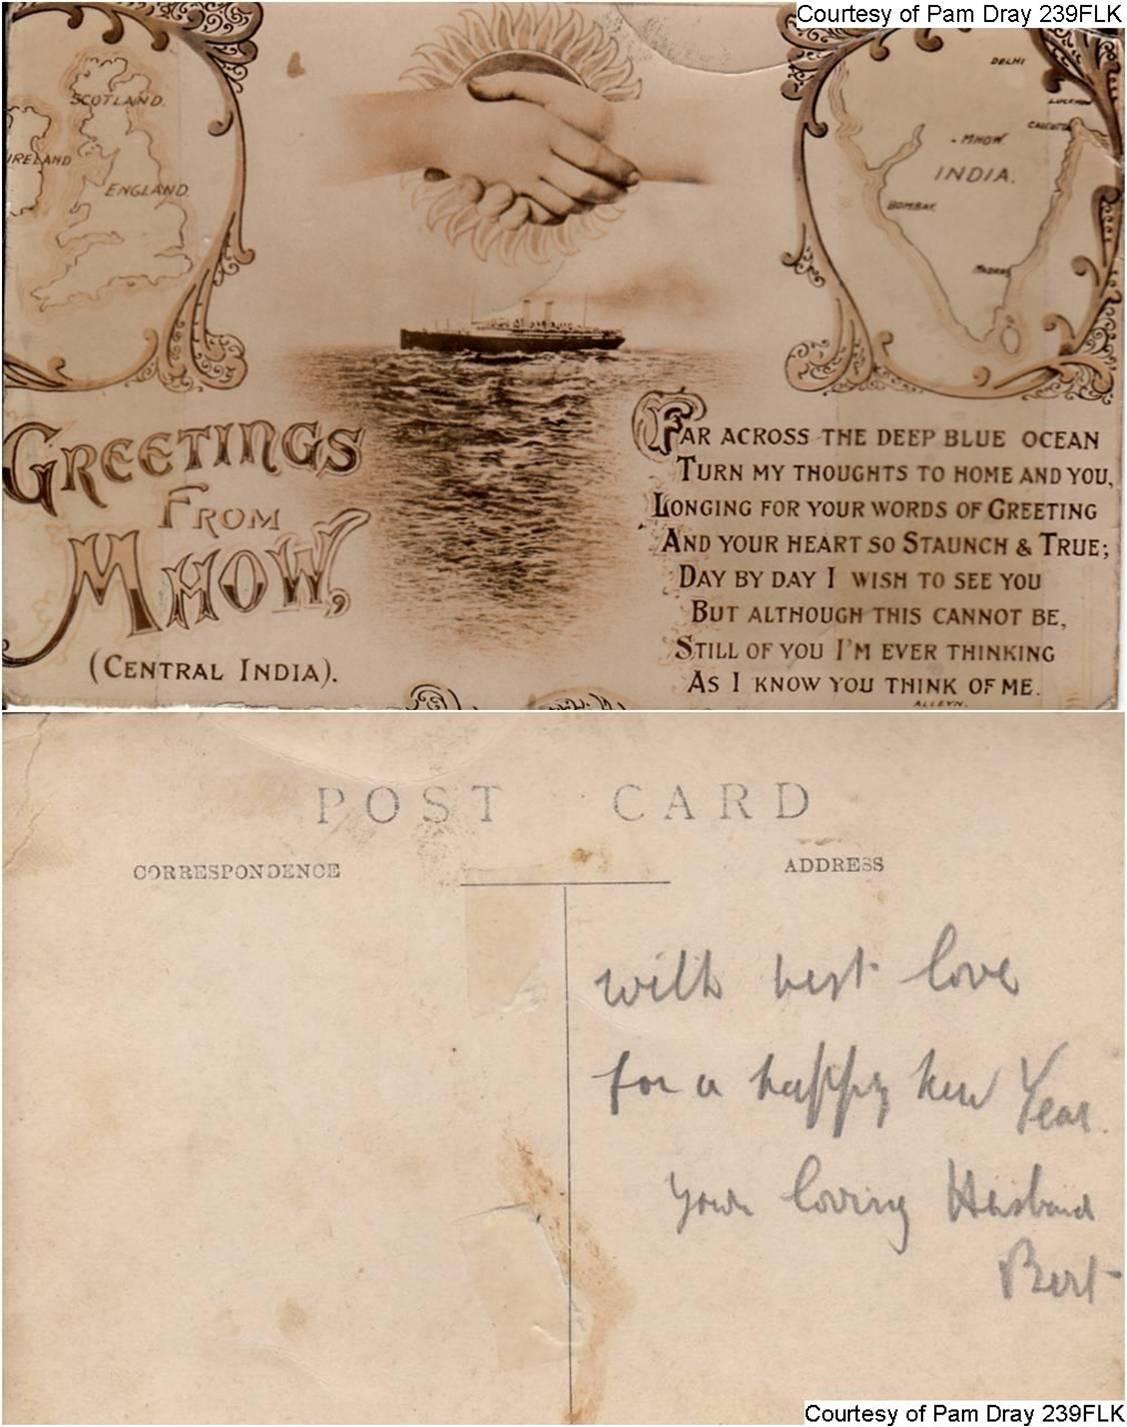 239FLK - Herbert's Postcard - Greetings From Mhow - (Front & Back)